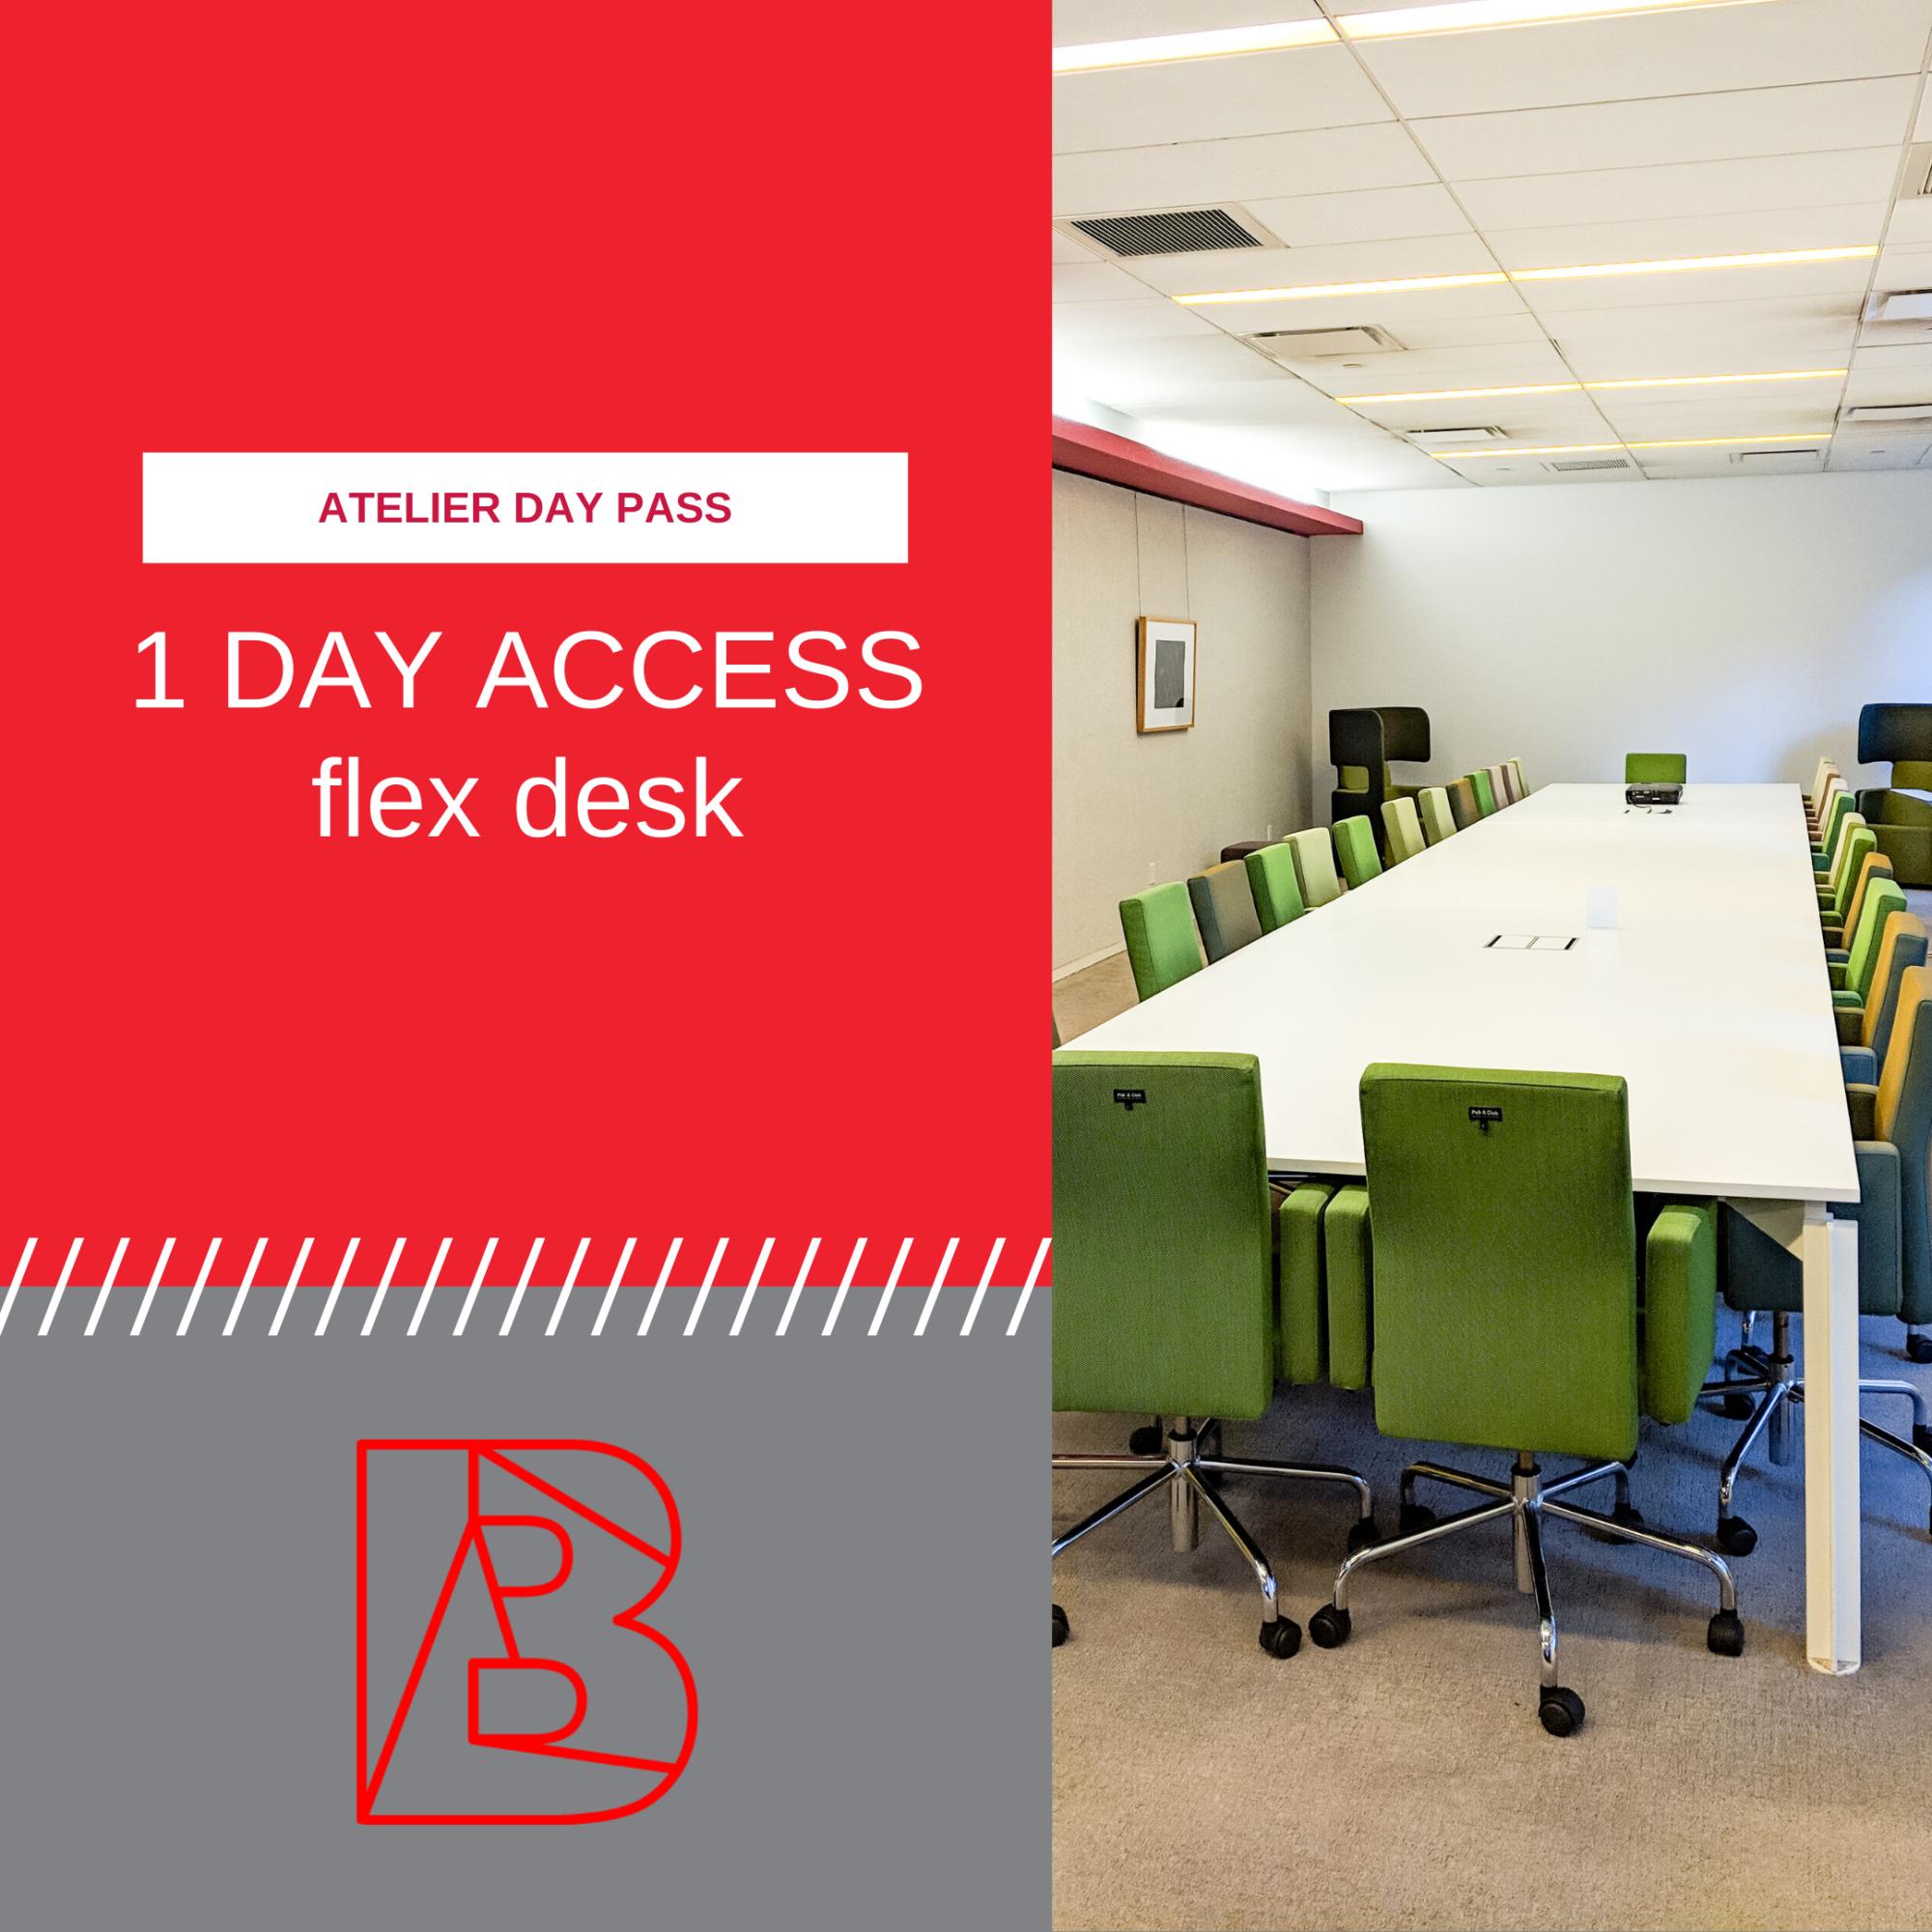 Day pass for flex desk